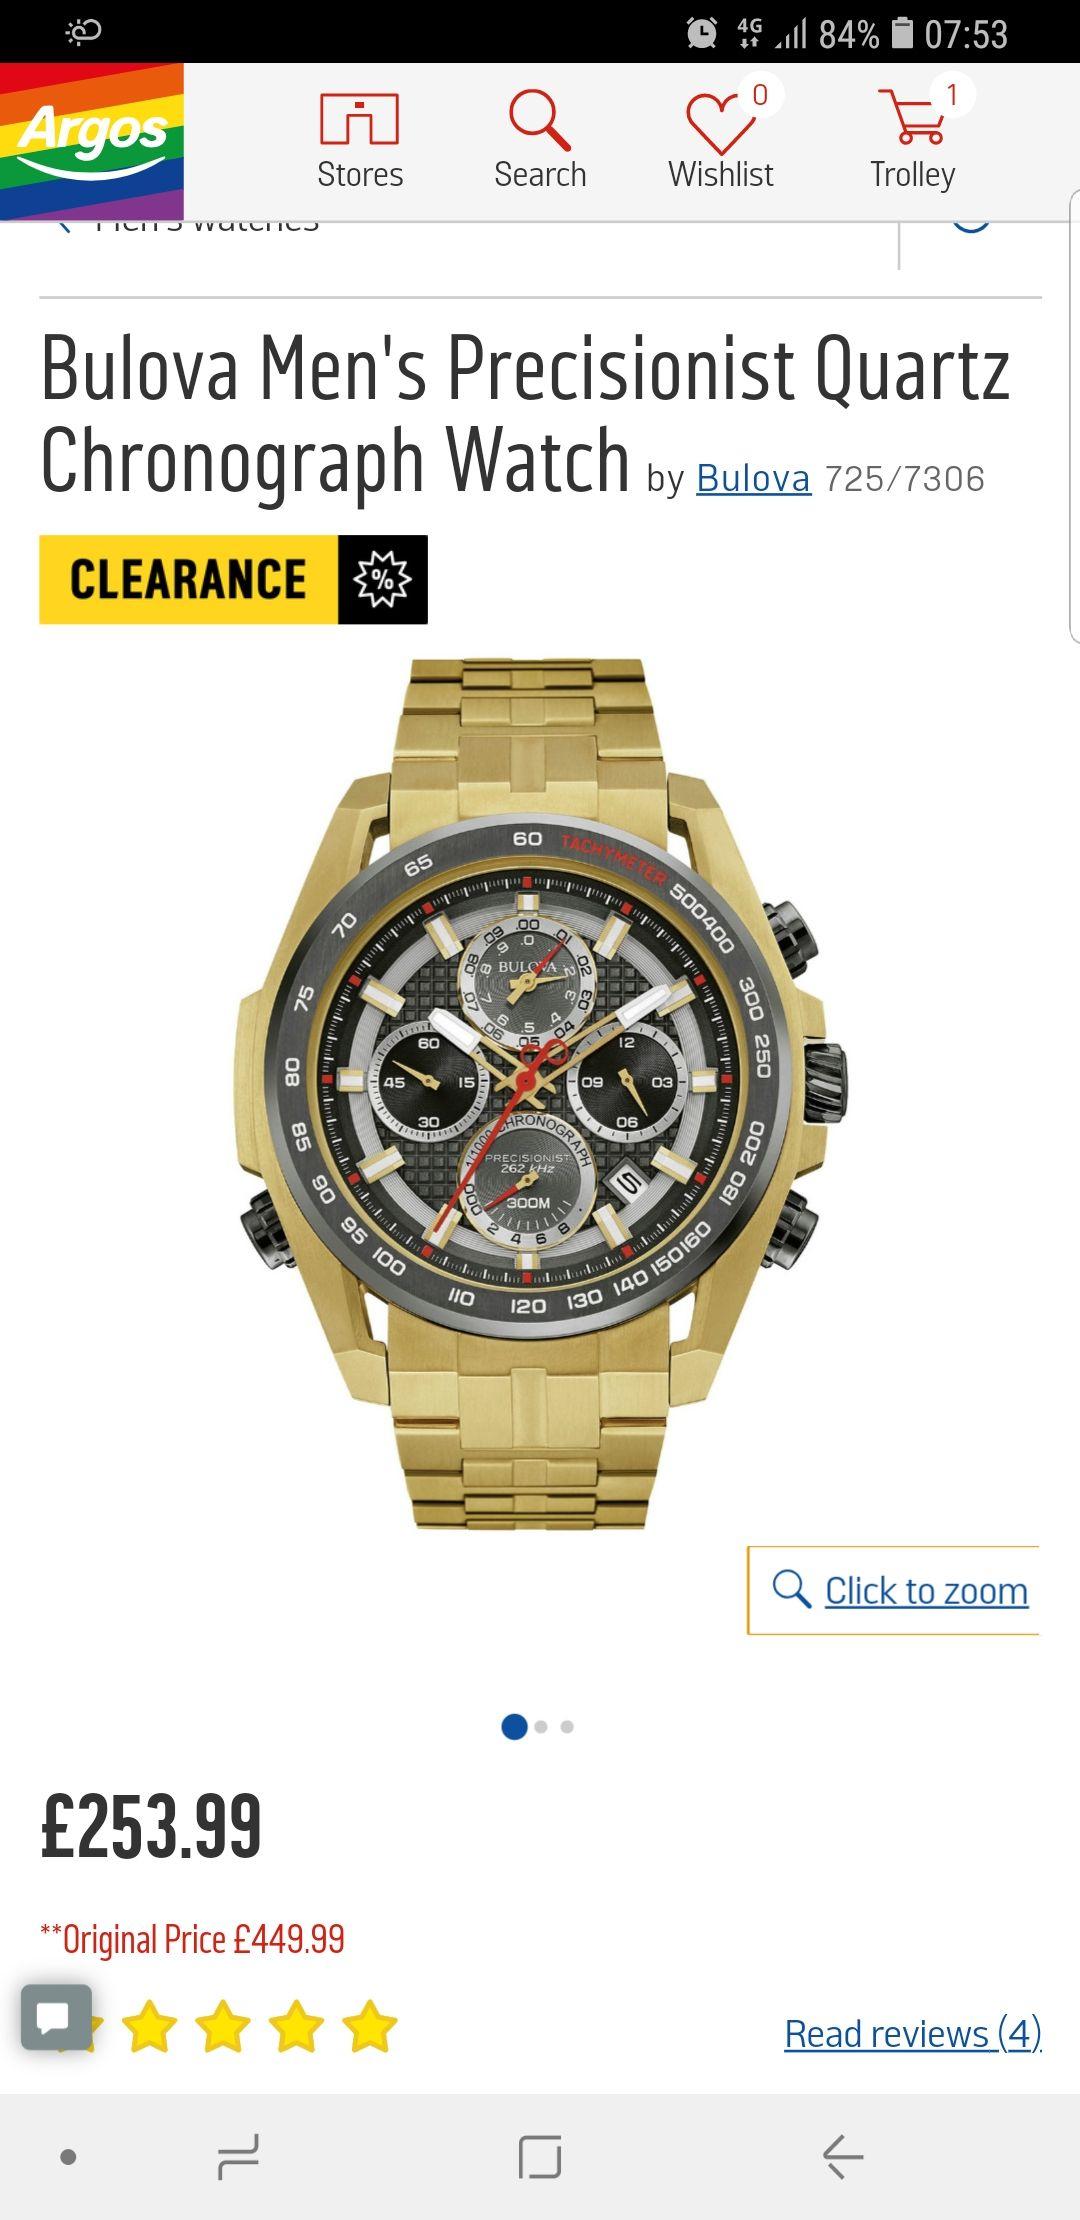 Bulova Men's Precisionist Quartz Chronograph Watch  was  £449.99 now £253.99 @ Argos